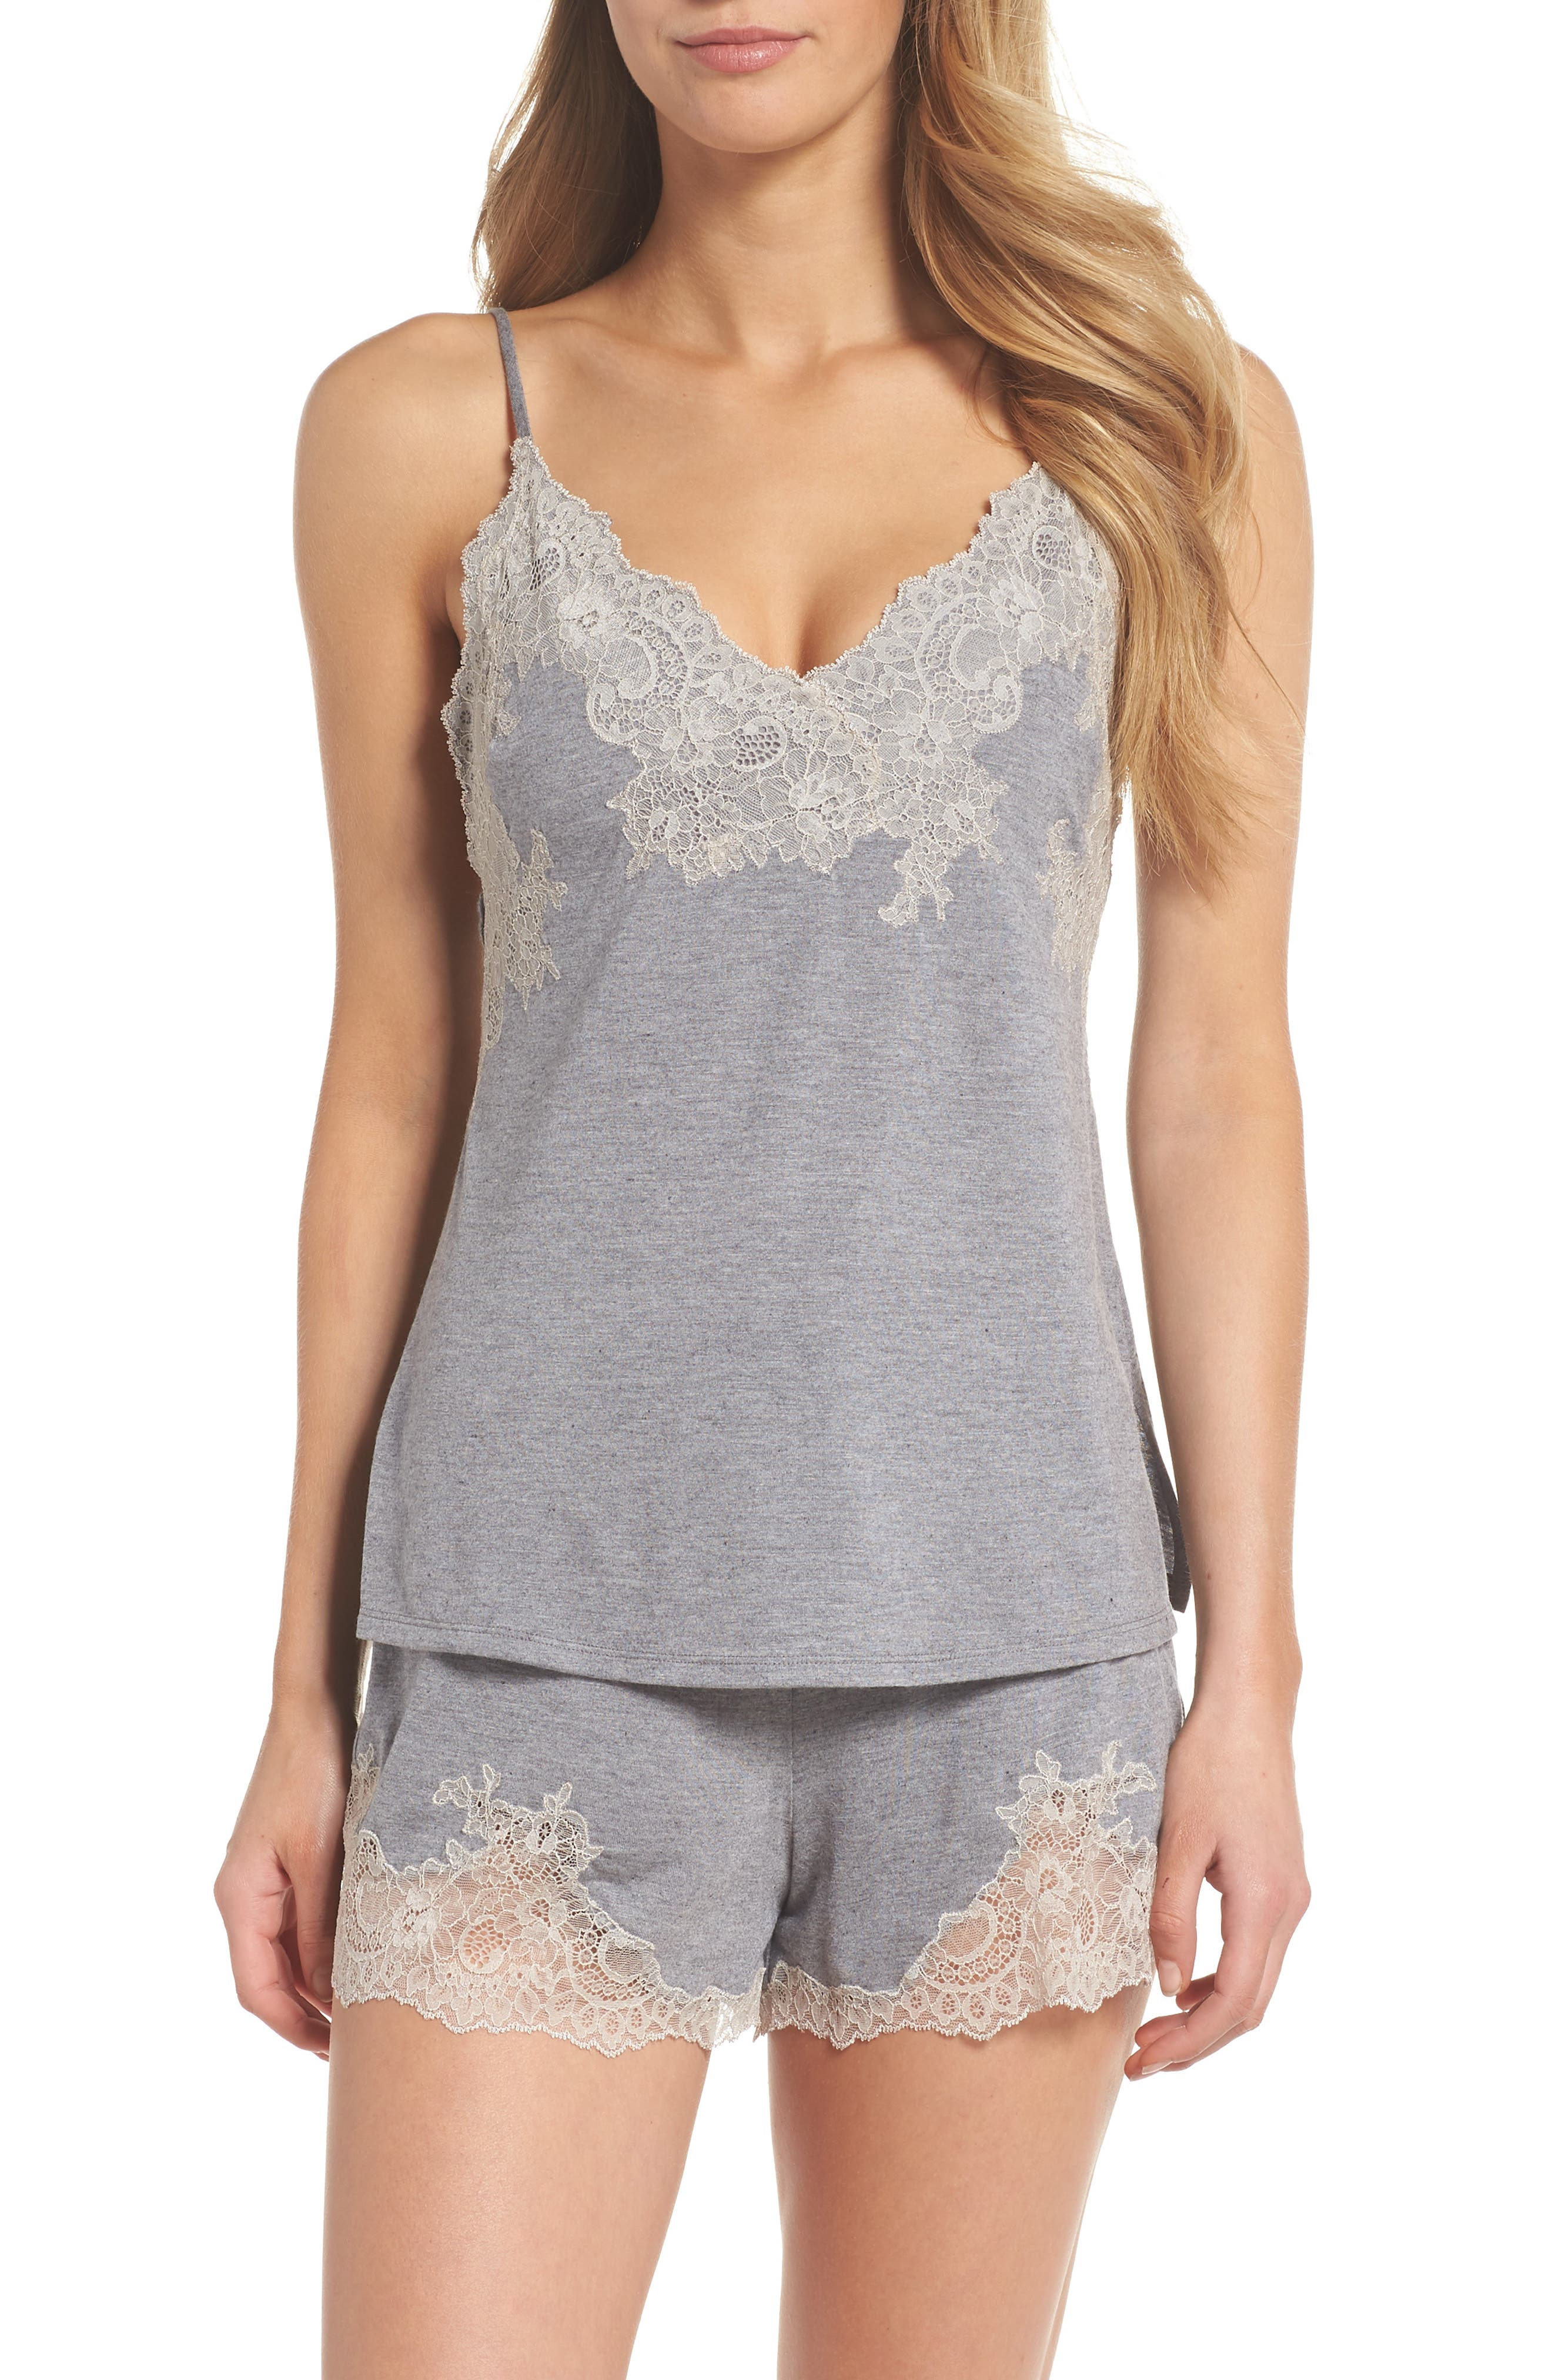 NATORI, Luxe Shangri-La Short Pajamas, Main thumbnail 1, color, GREY